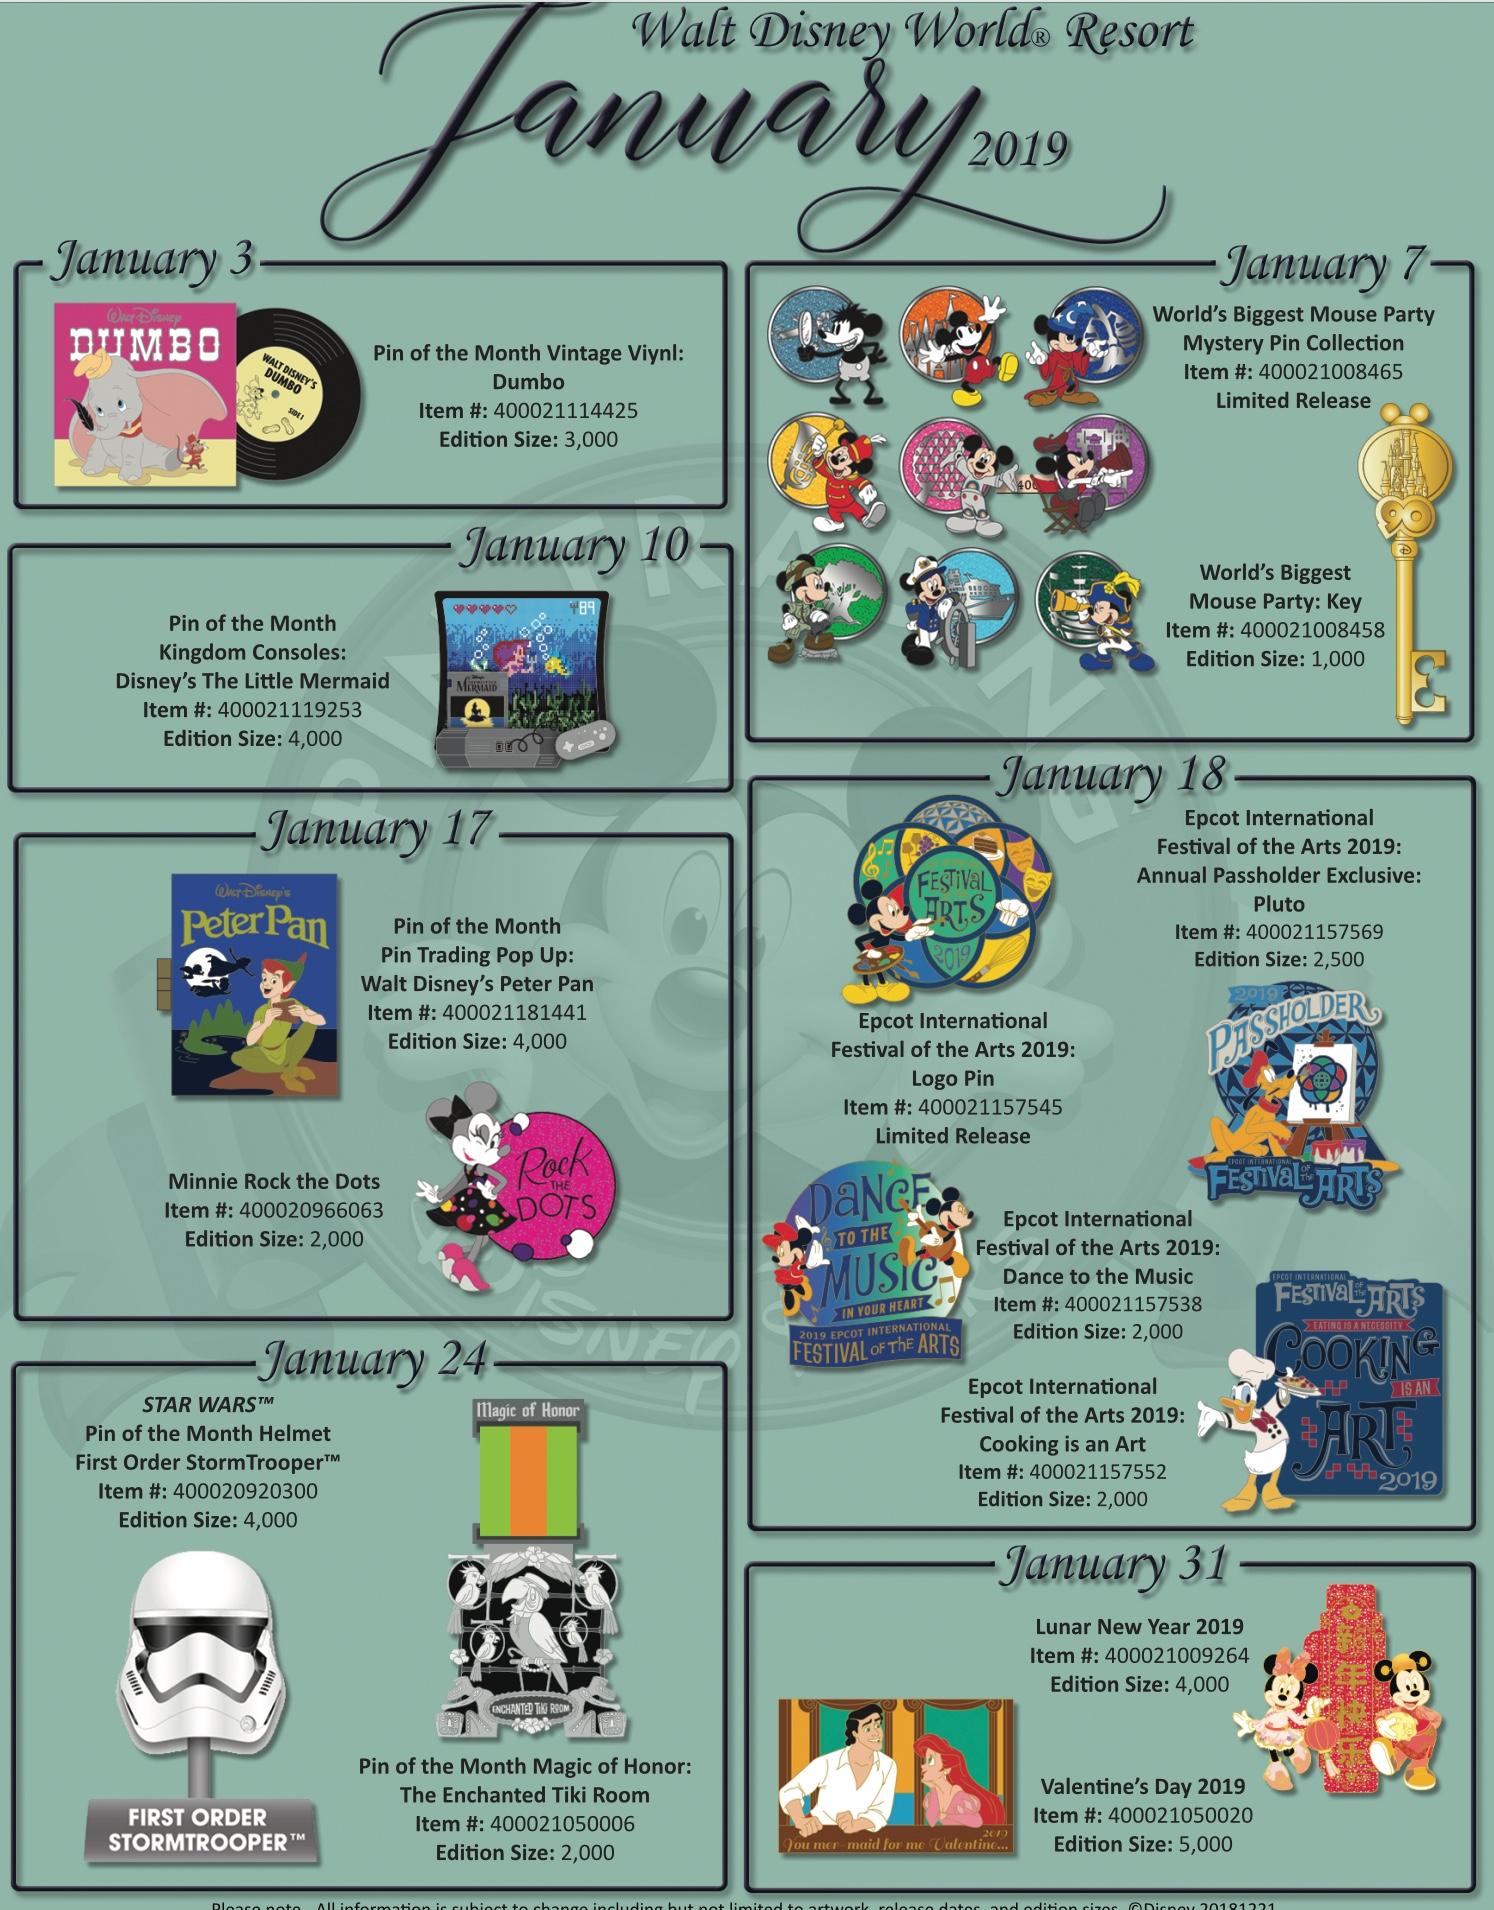 Walt Disney World January Pins Announced Diskingdom Com Disney Marvel Star Wars